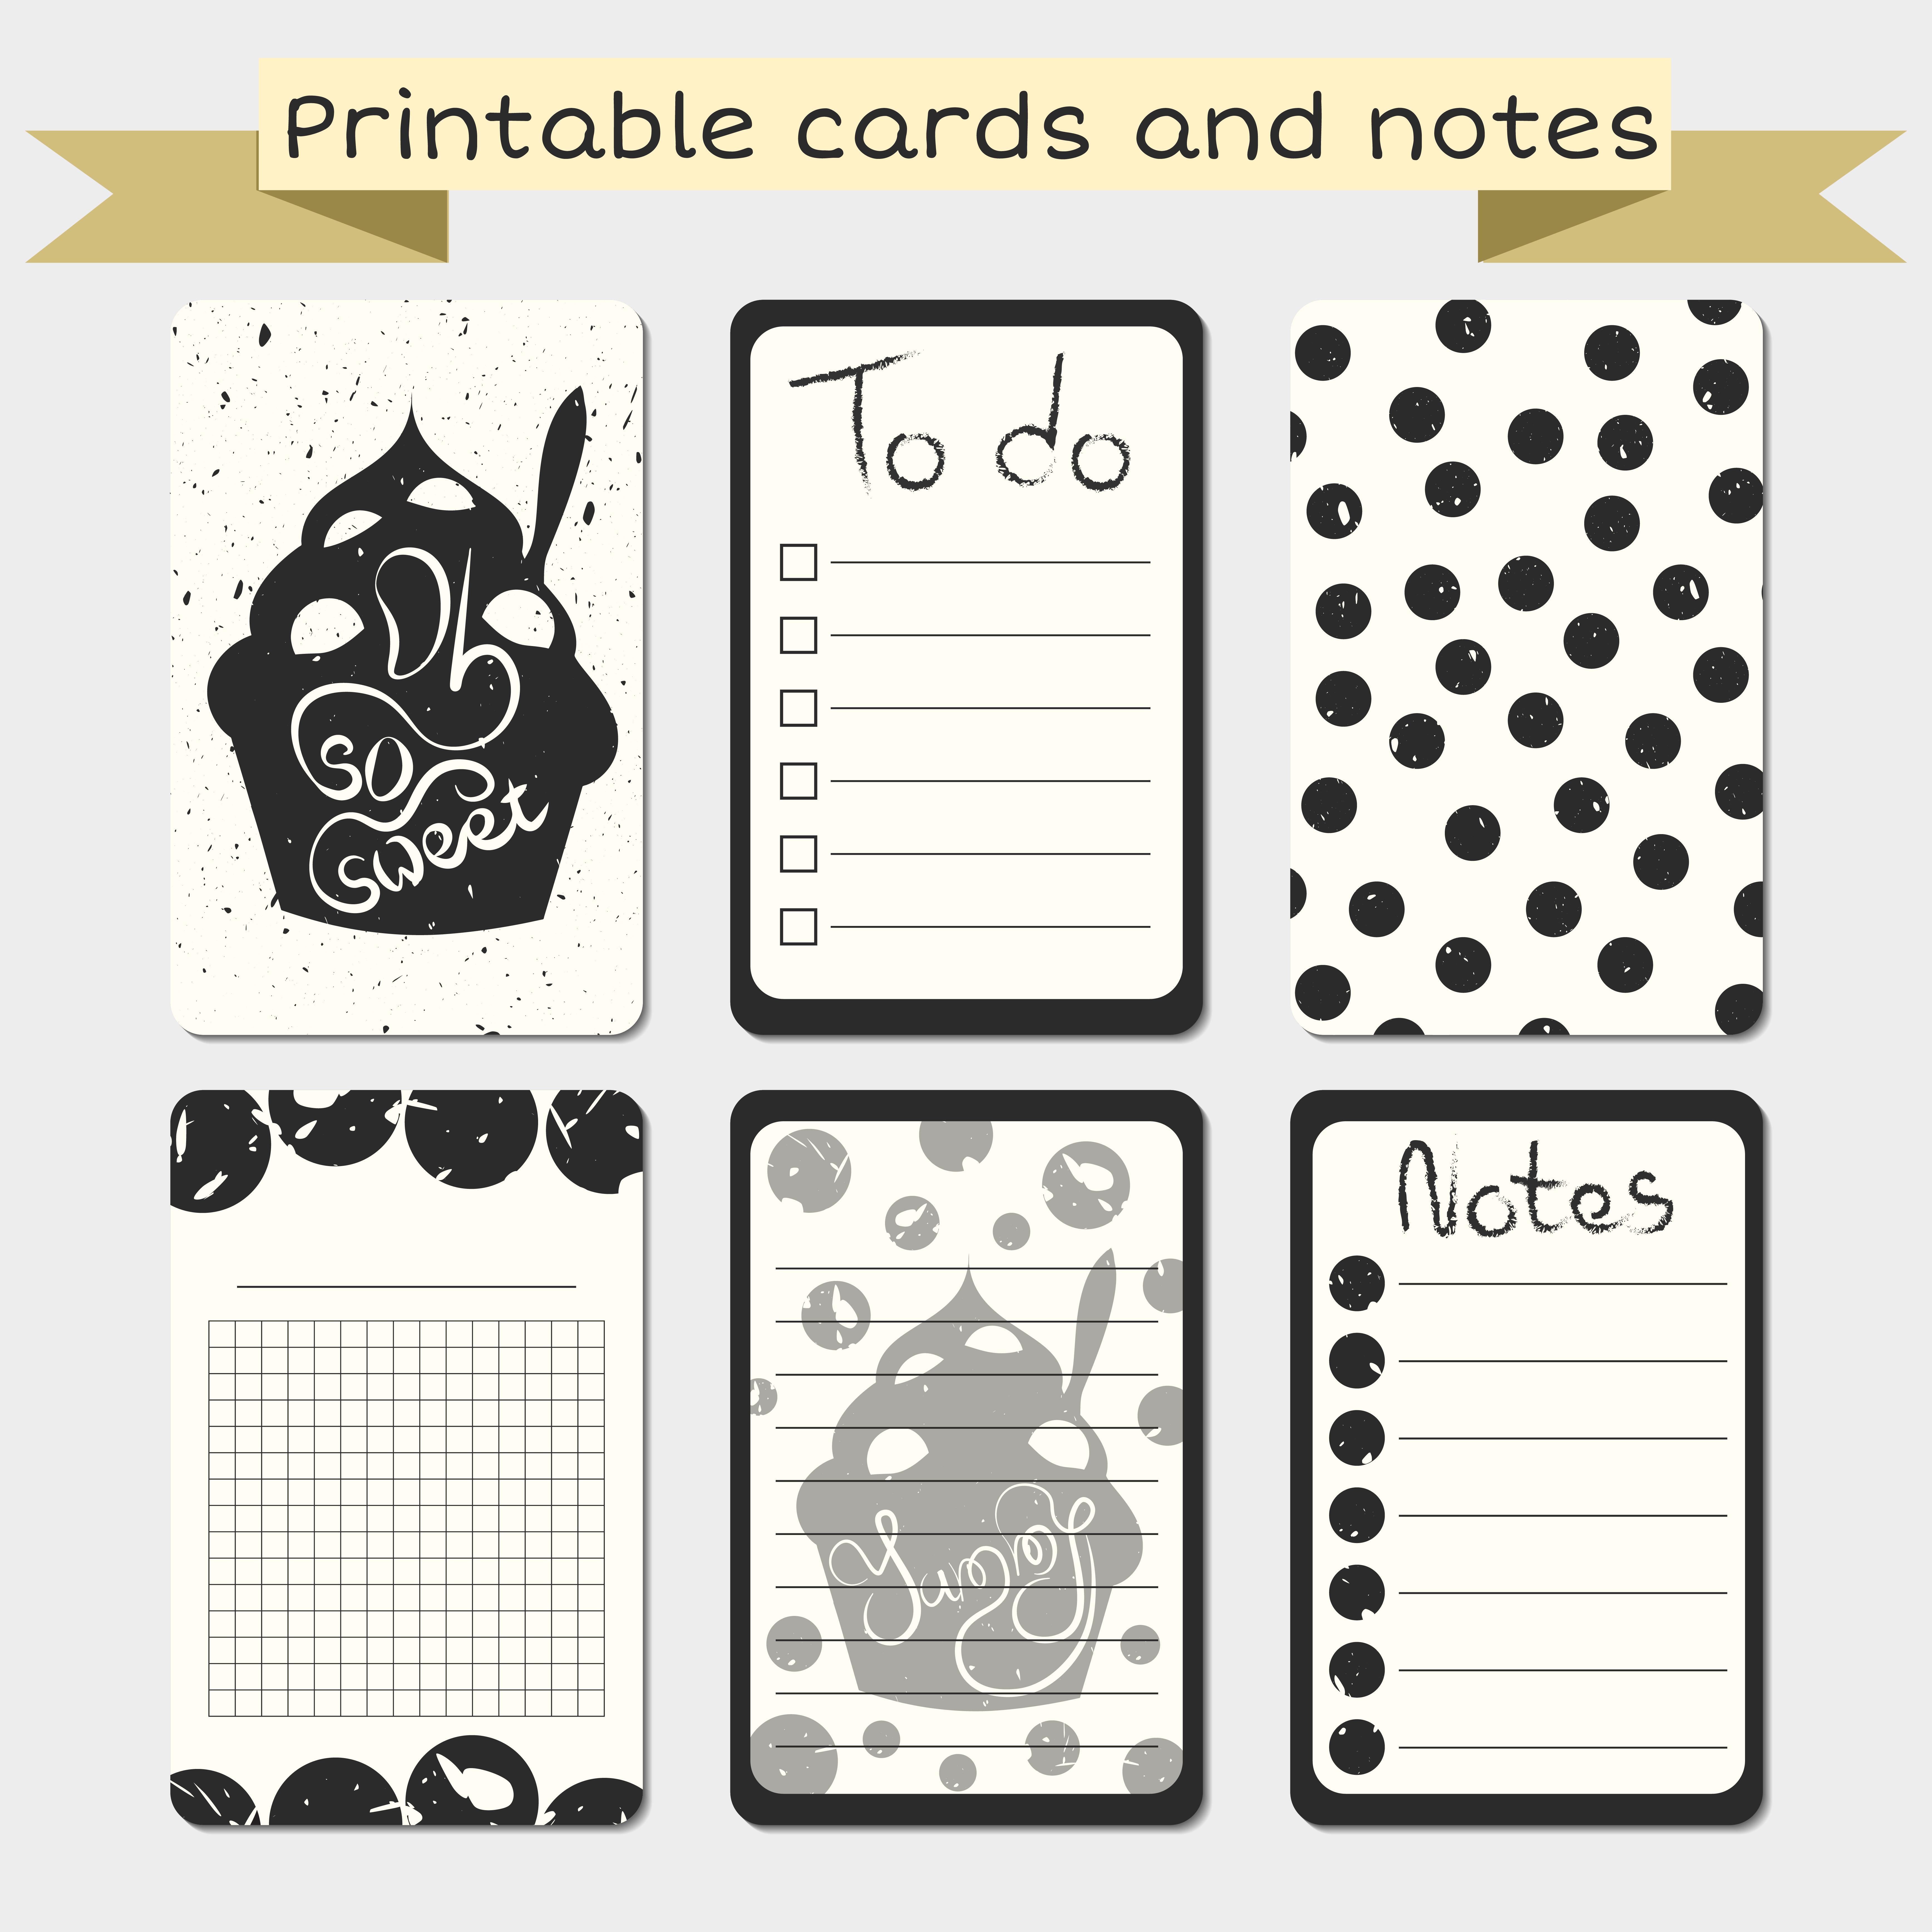 Printable journaling cards. Notes designs. - Download Free ...